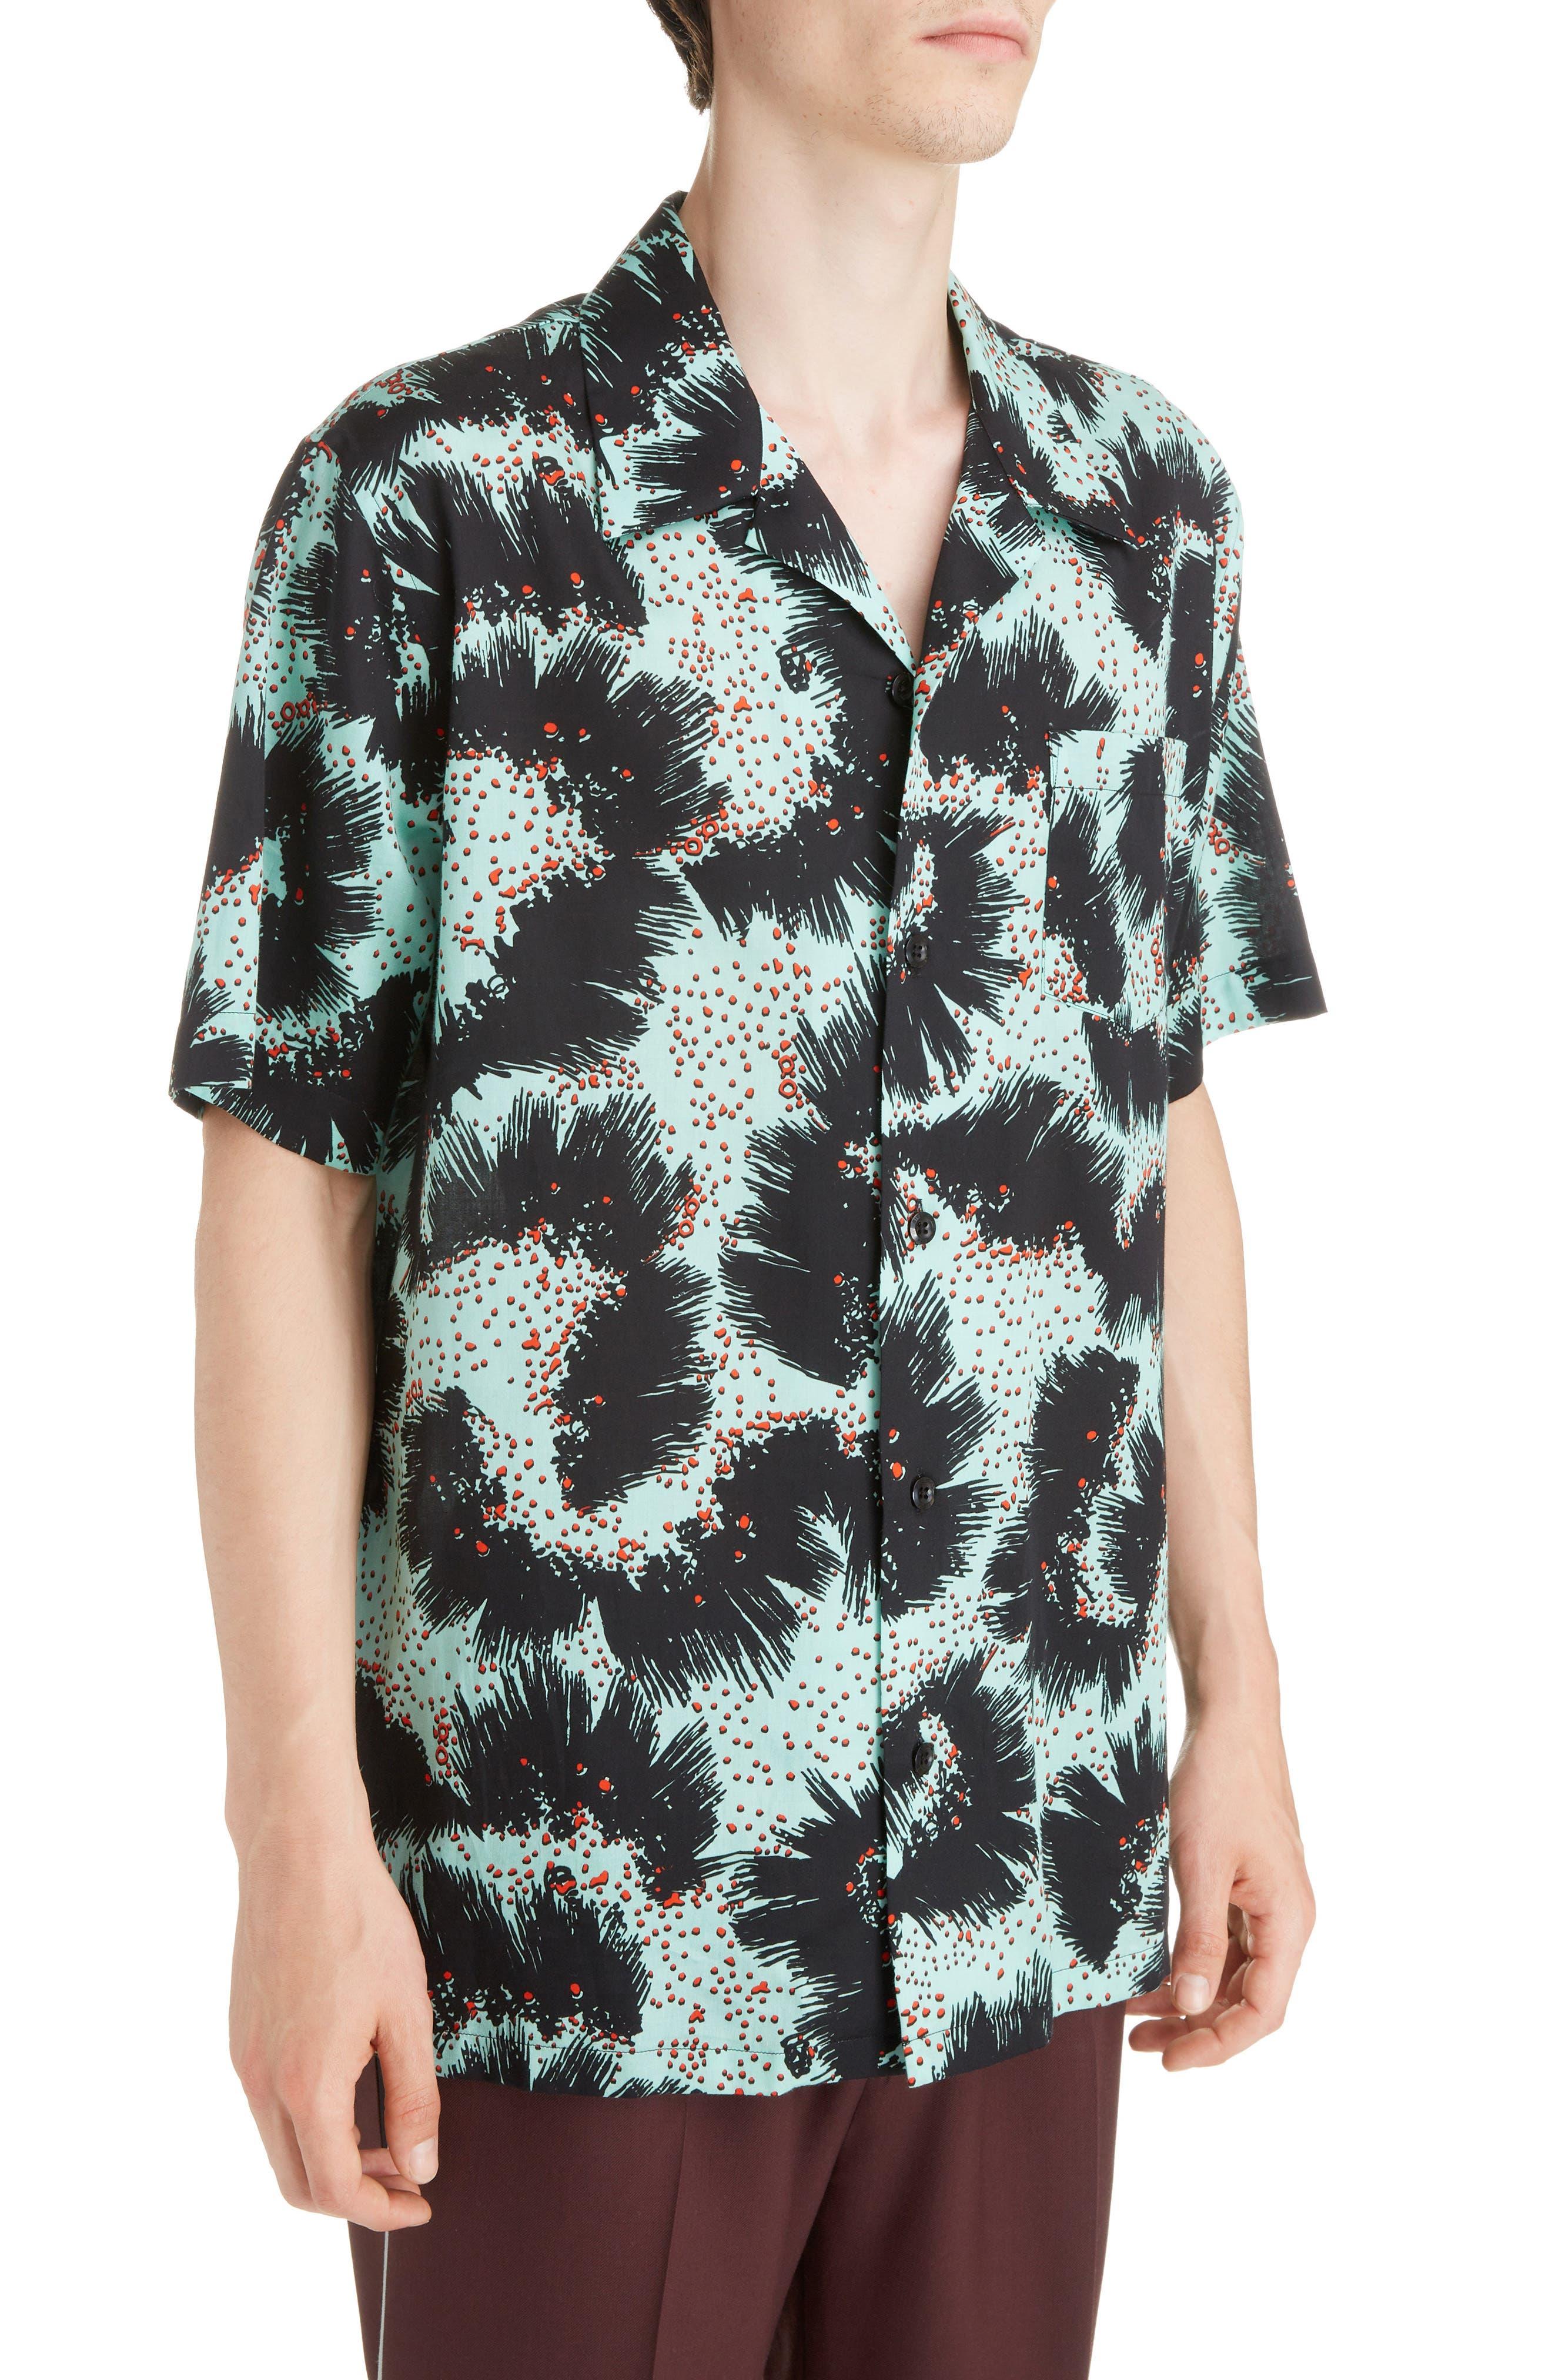 Rock Urchin Camp Shirt,                             Alternate thumbnail 2, color,                             GREEN/BLACK